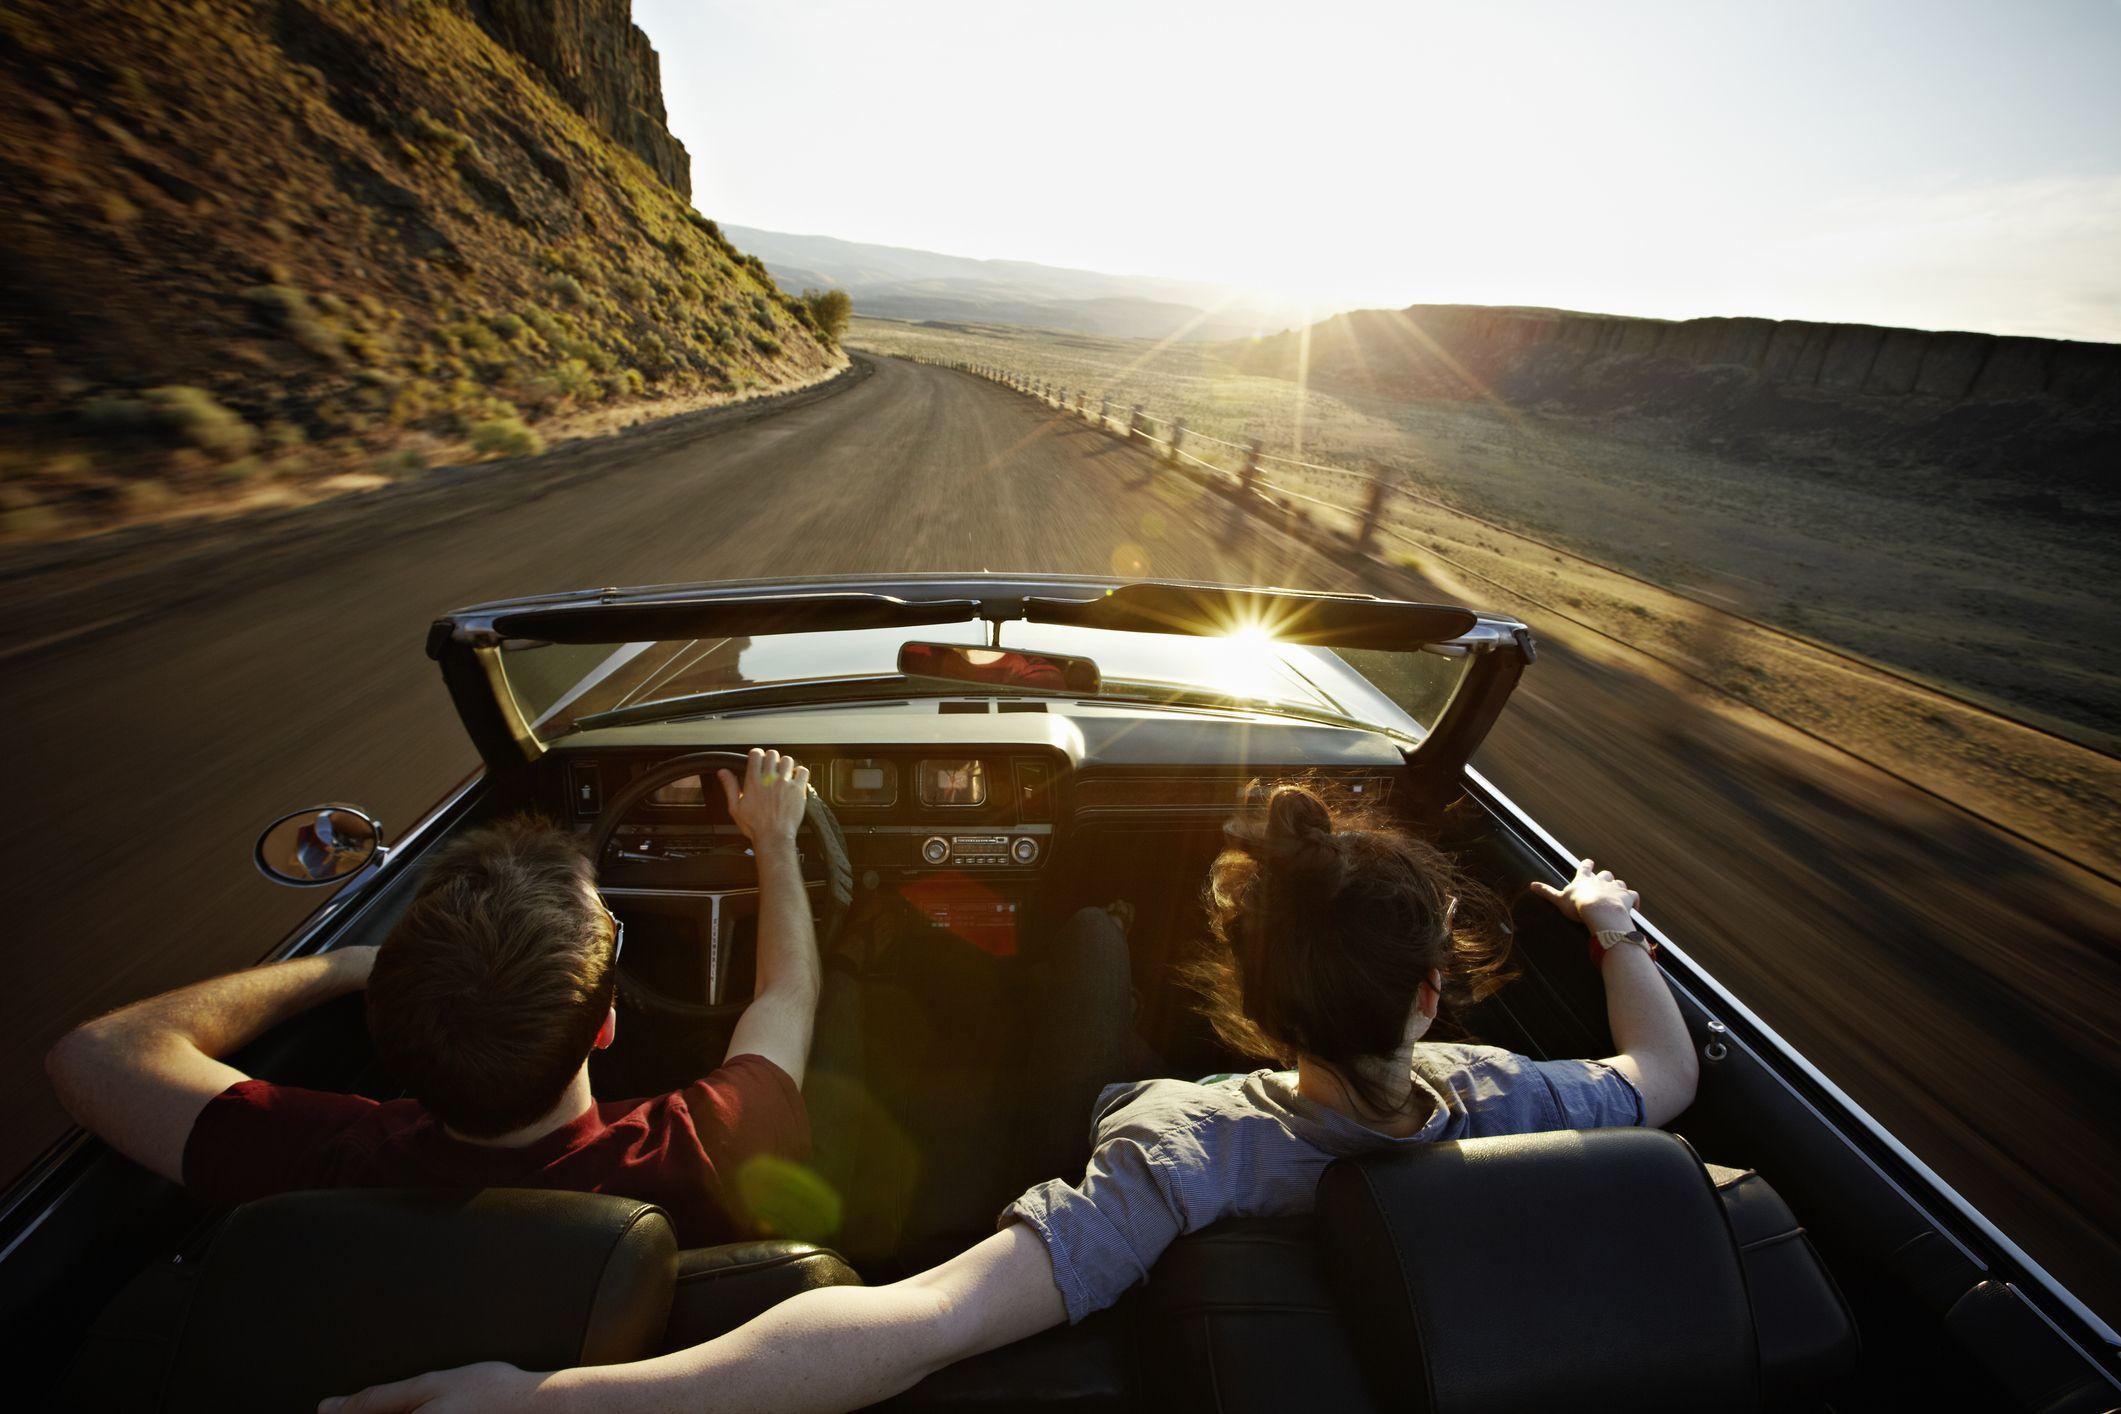 ¿Está listo su auto para viaje por carretera?